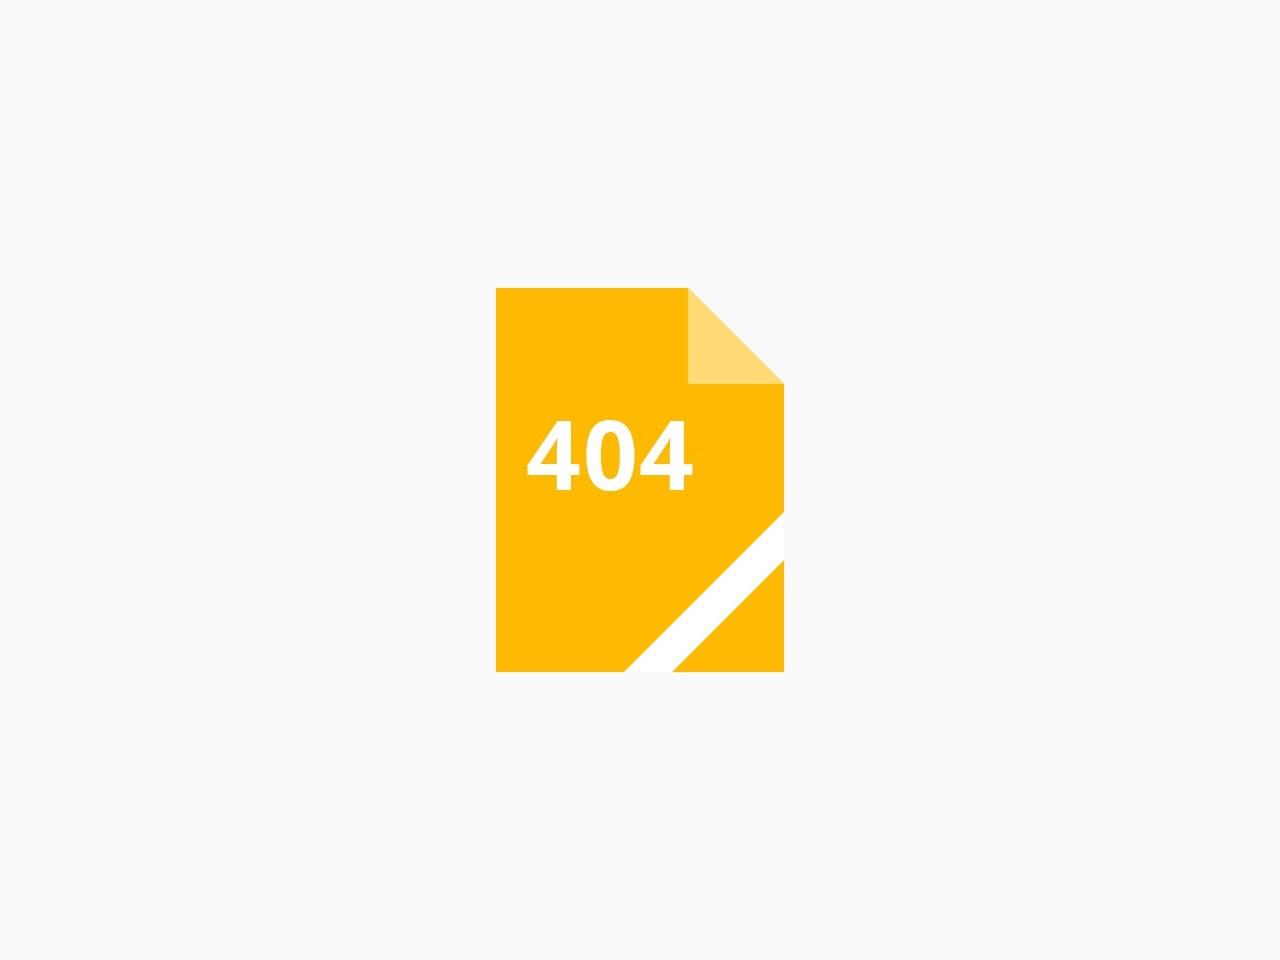 Mixed Reality Portal App löschen Windows 10 Deskmodder Wiki